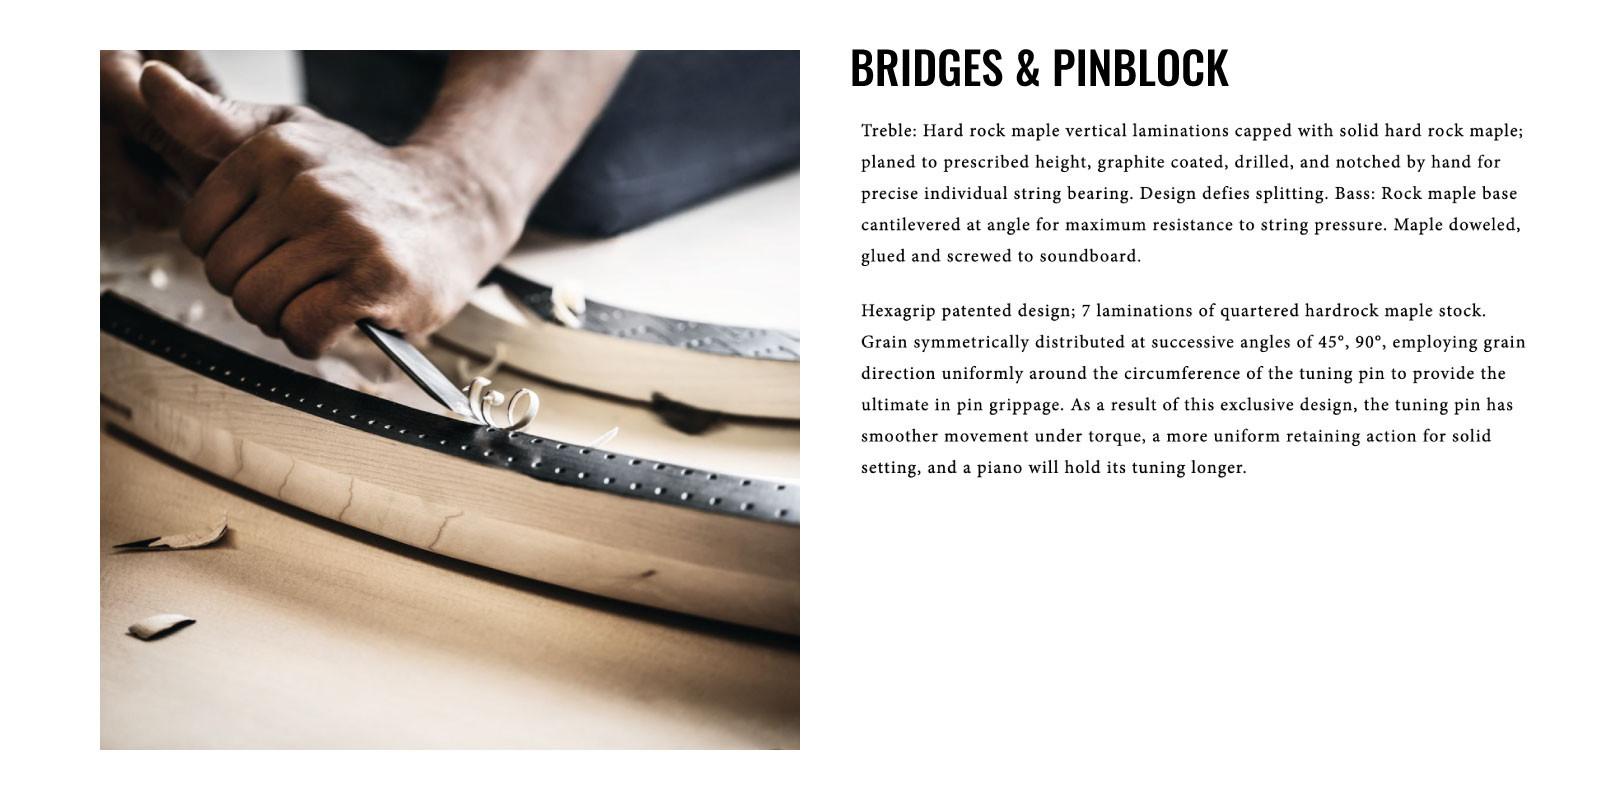 PP-Steinway-MODEL-1098-Details-6.jpg